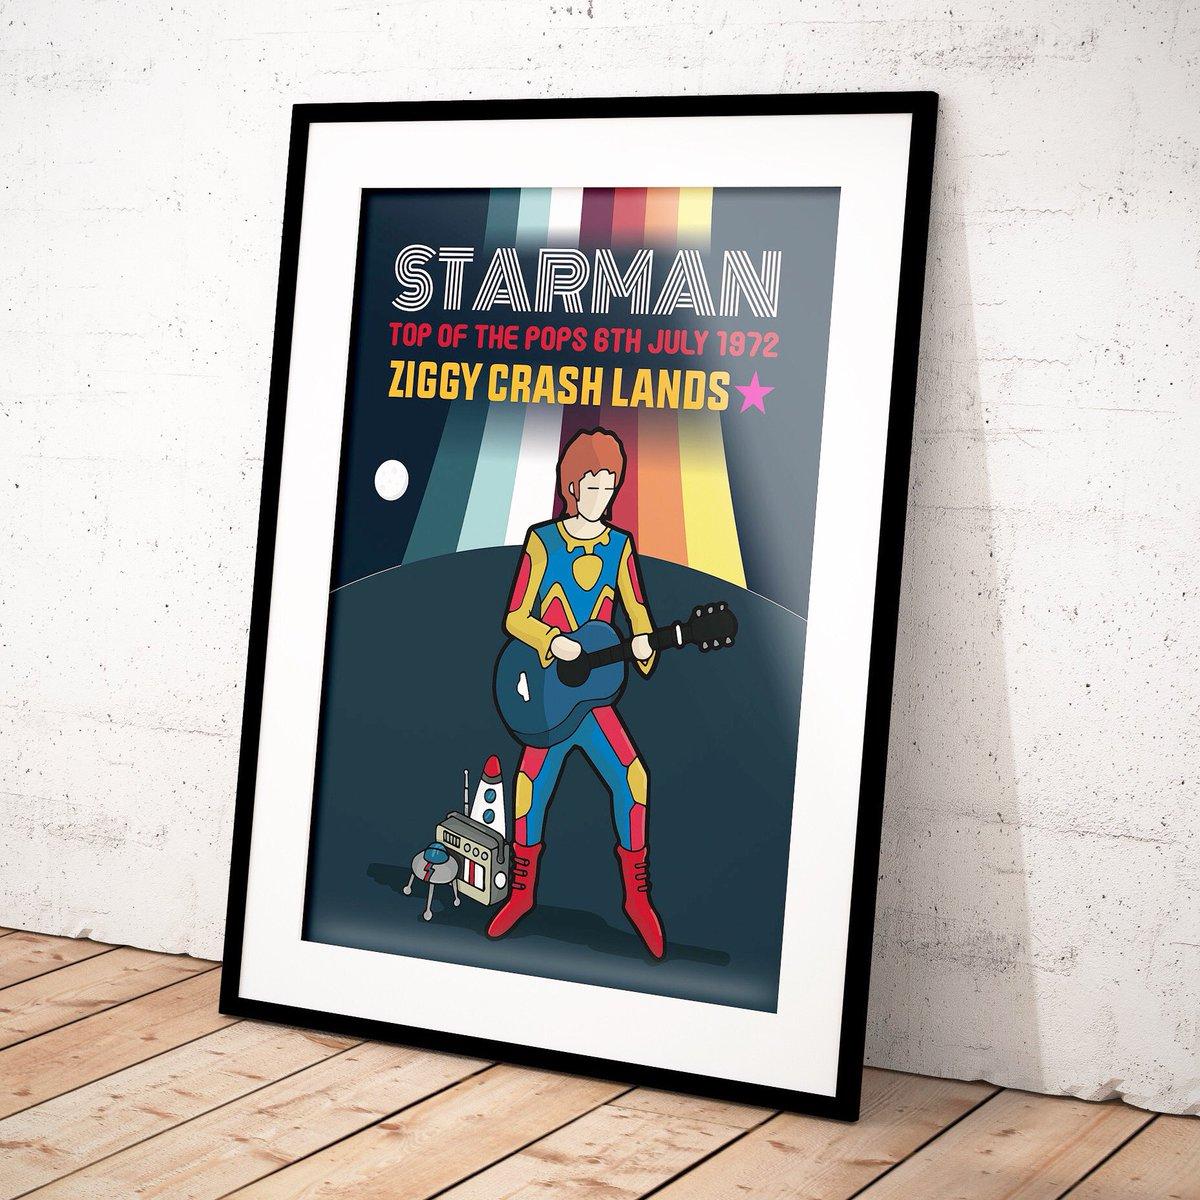 A sneak peek... A STARMAN MAY LAND TONIGHT.... #davidbowie #starman #ziggystardust #ziggystardustandthespidersfrommars #radio #space #spaceship #topofthepops #moon #rocket #jumpsuit #70sfashionpic.twitter.com/UkQQxaYXRQ